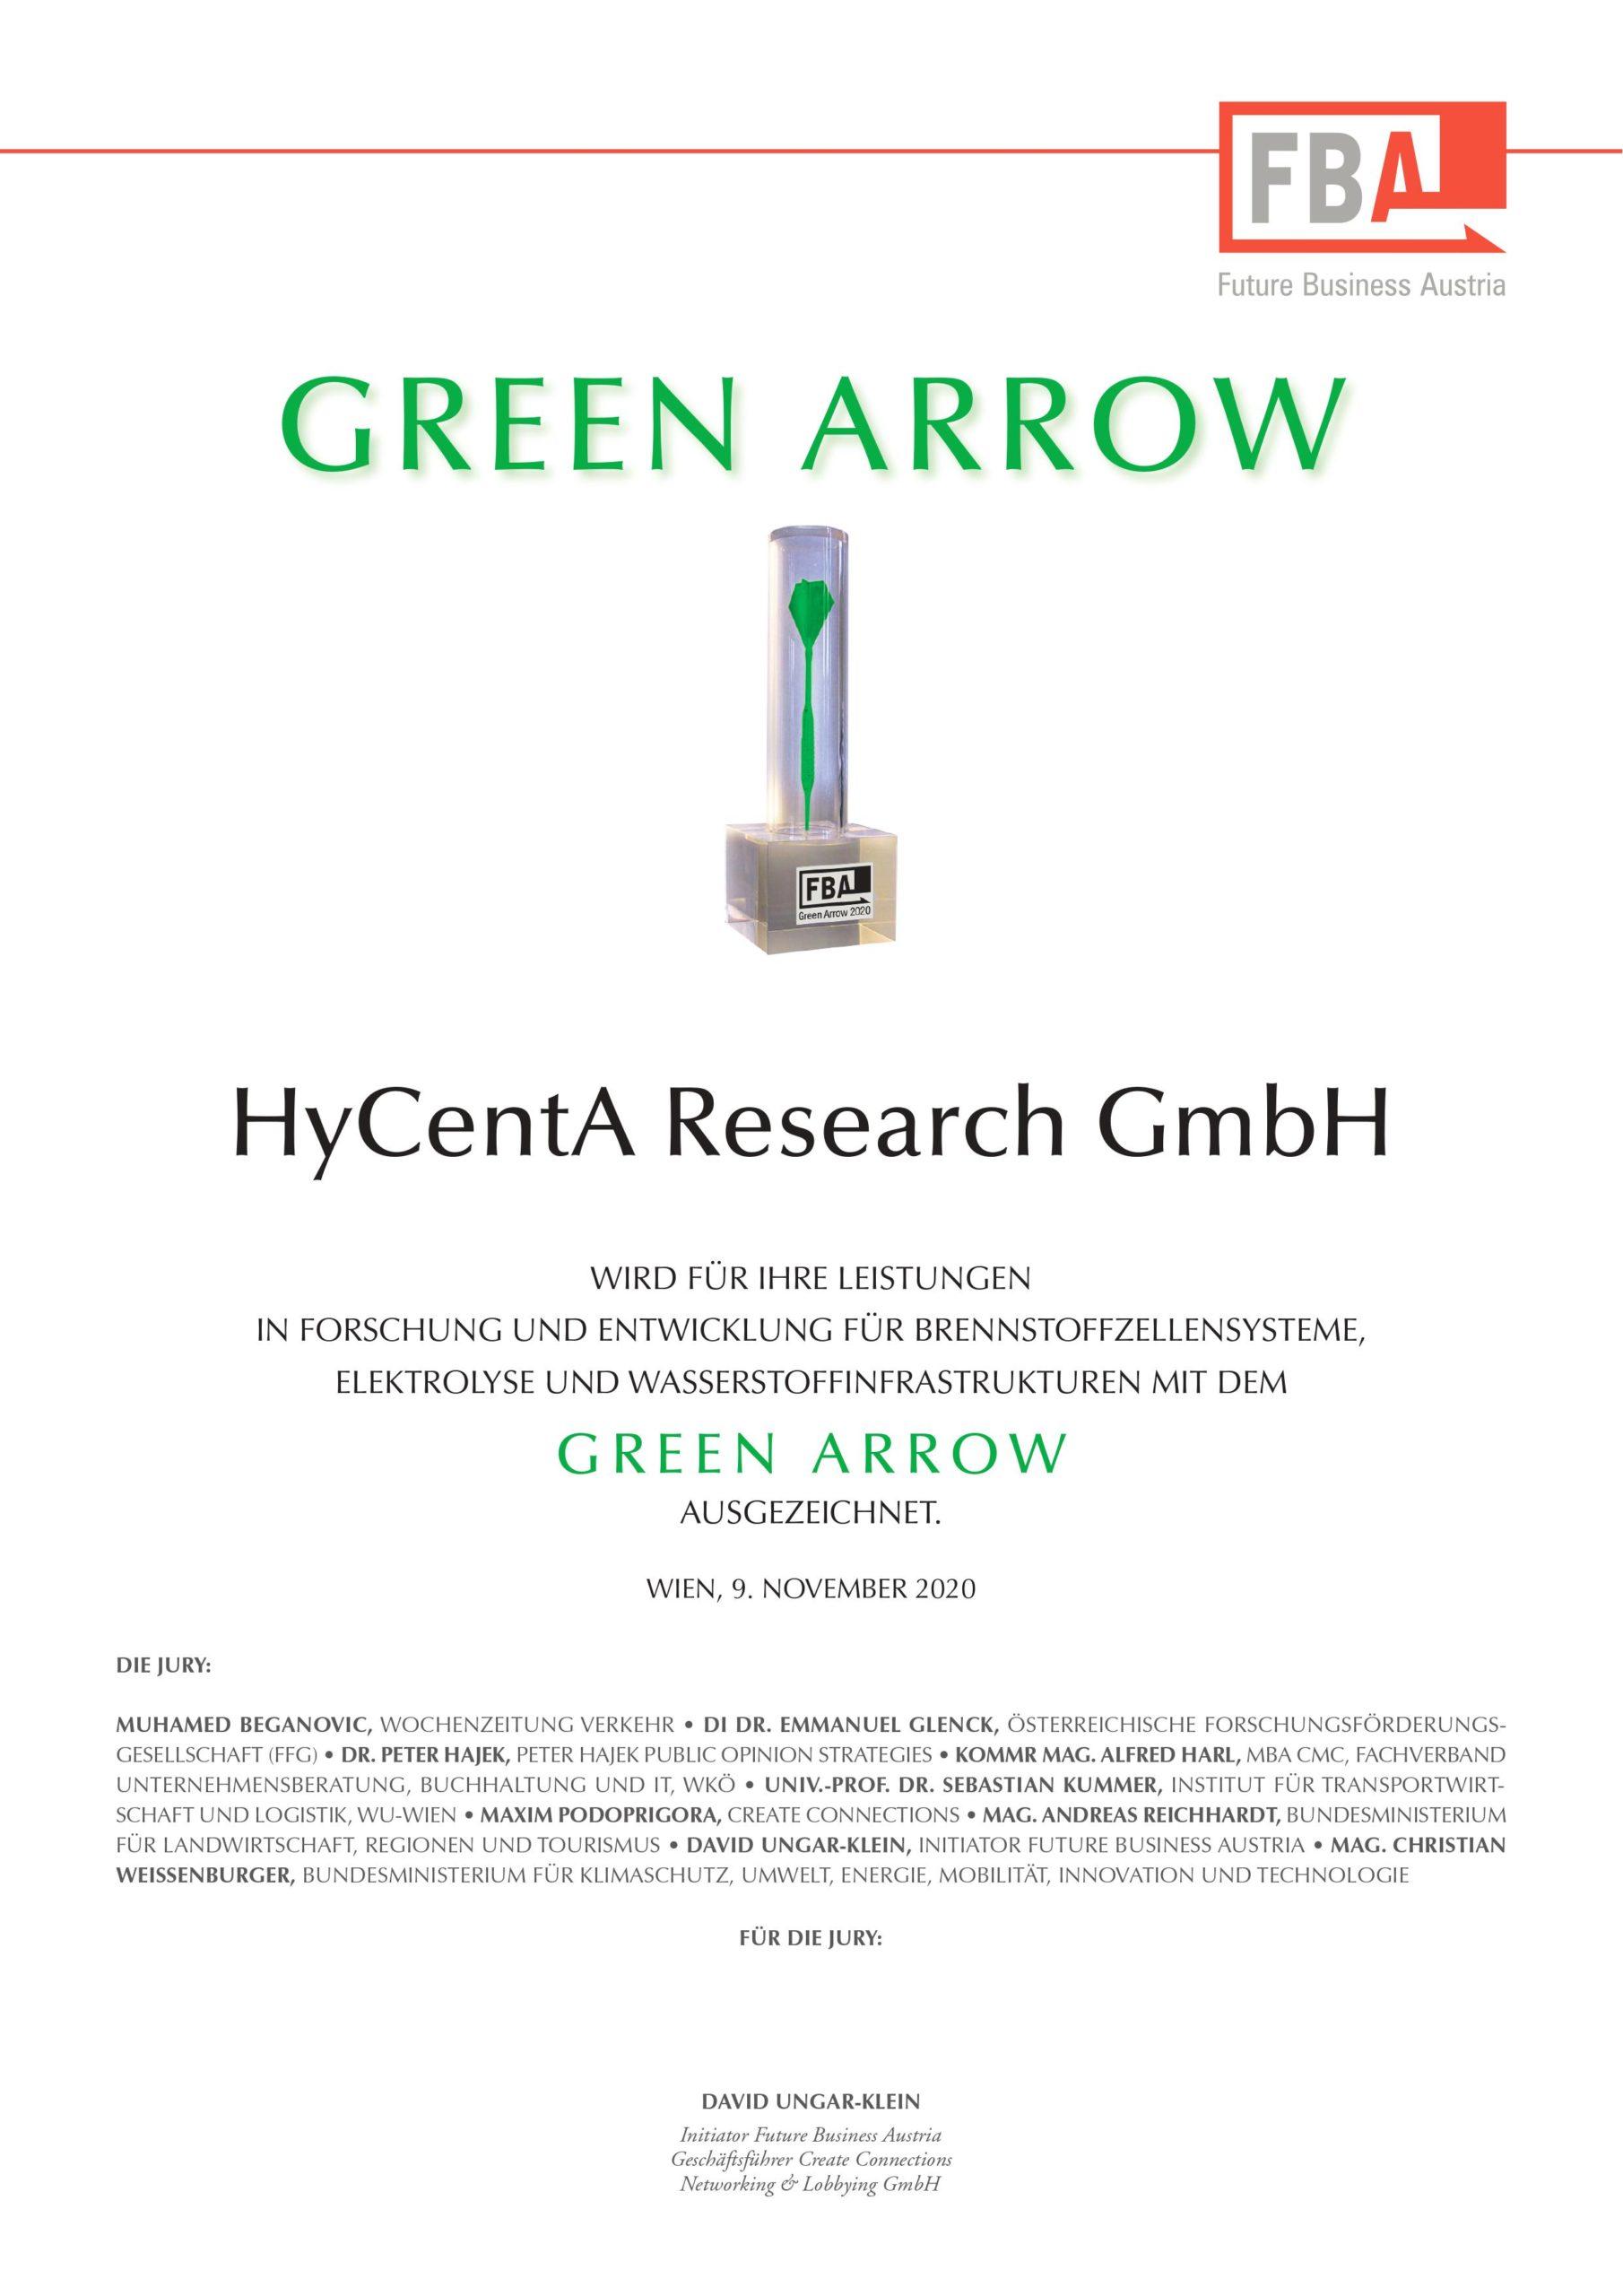 Green Arrow Preisträger 2020